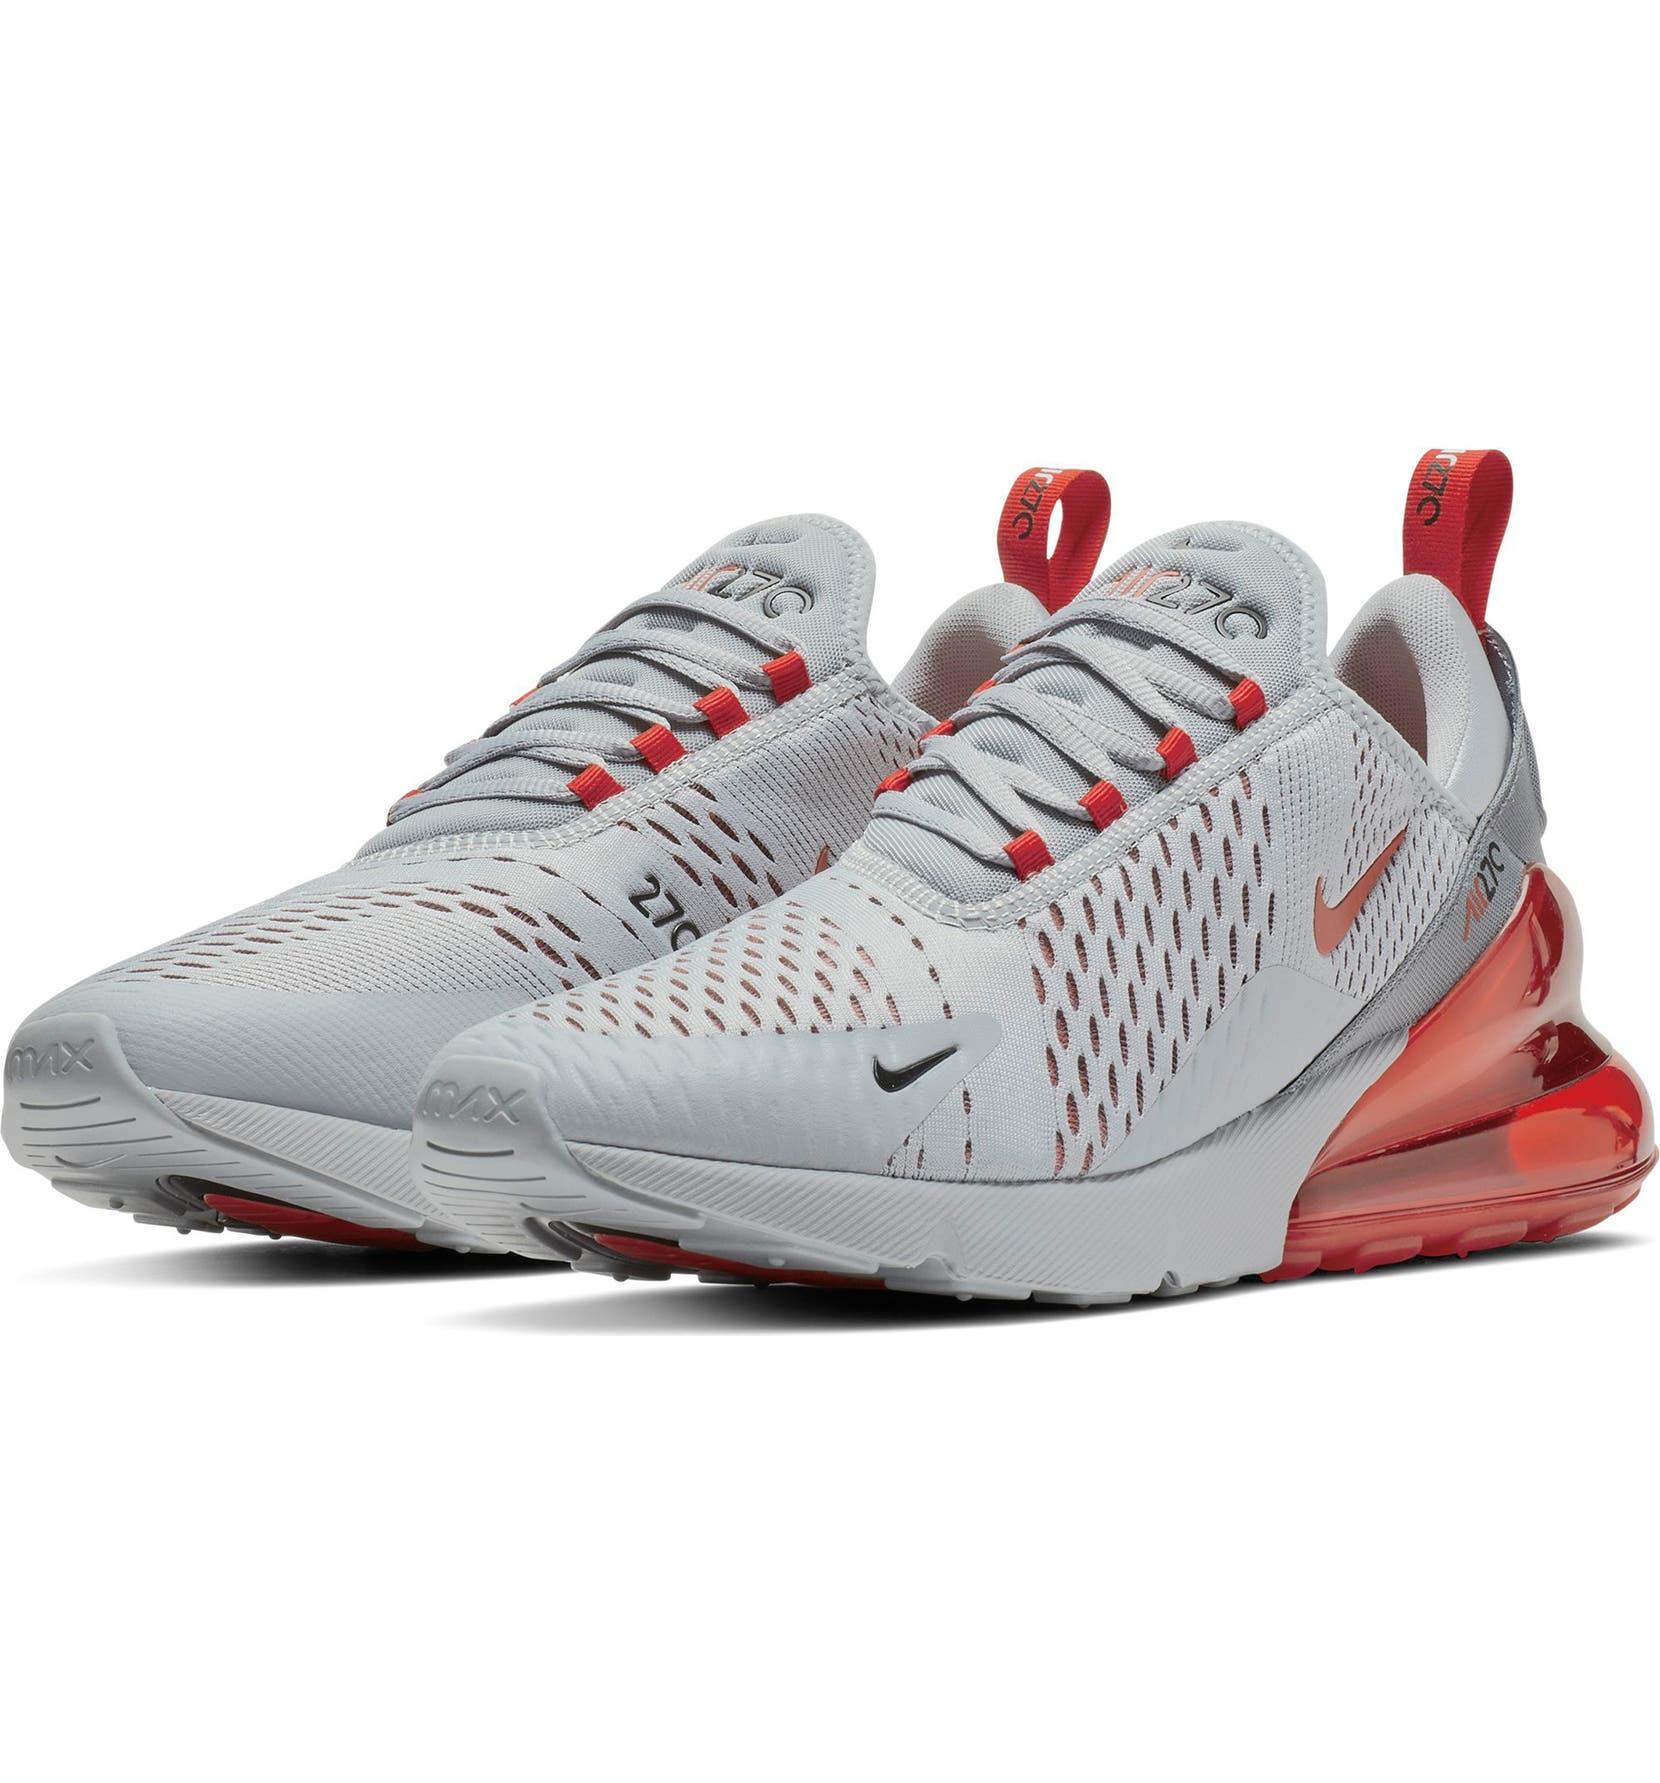 hot sale online 47e83 84a18 Nike Air Max 270 Sneaker (Men)   Nordstrom